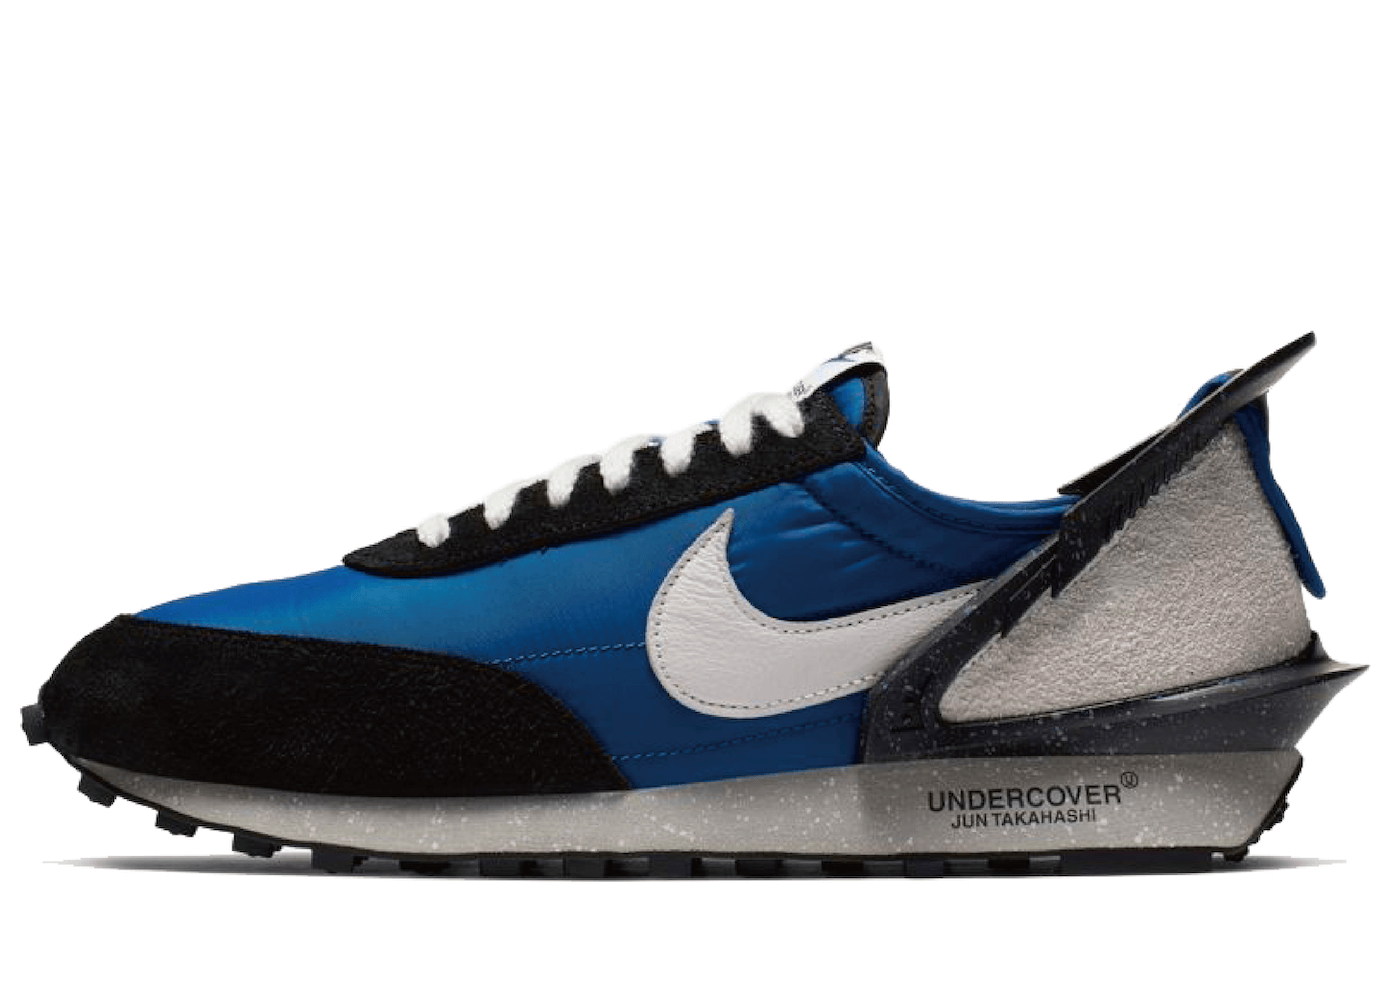 Nike Daybreak Undercover Blue Jayの写真